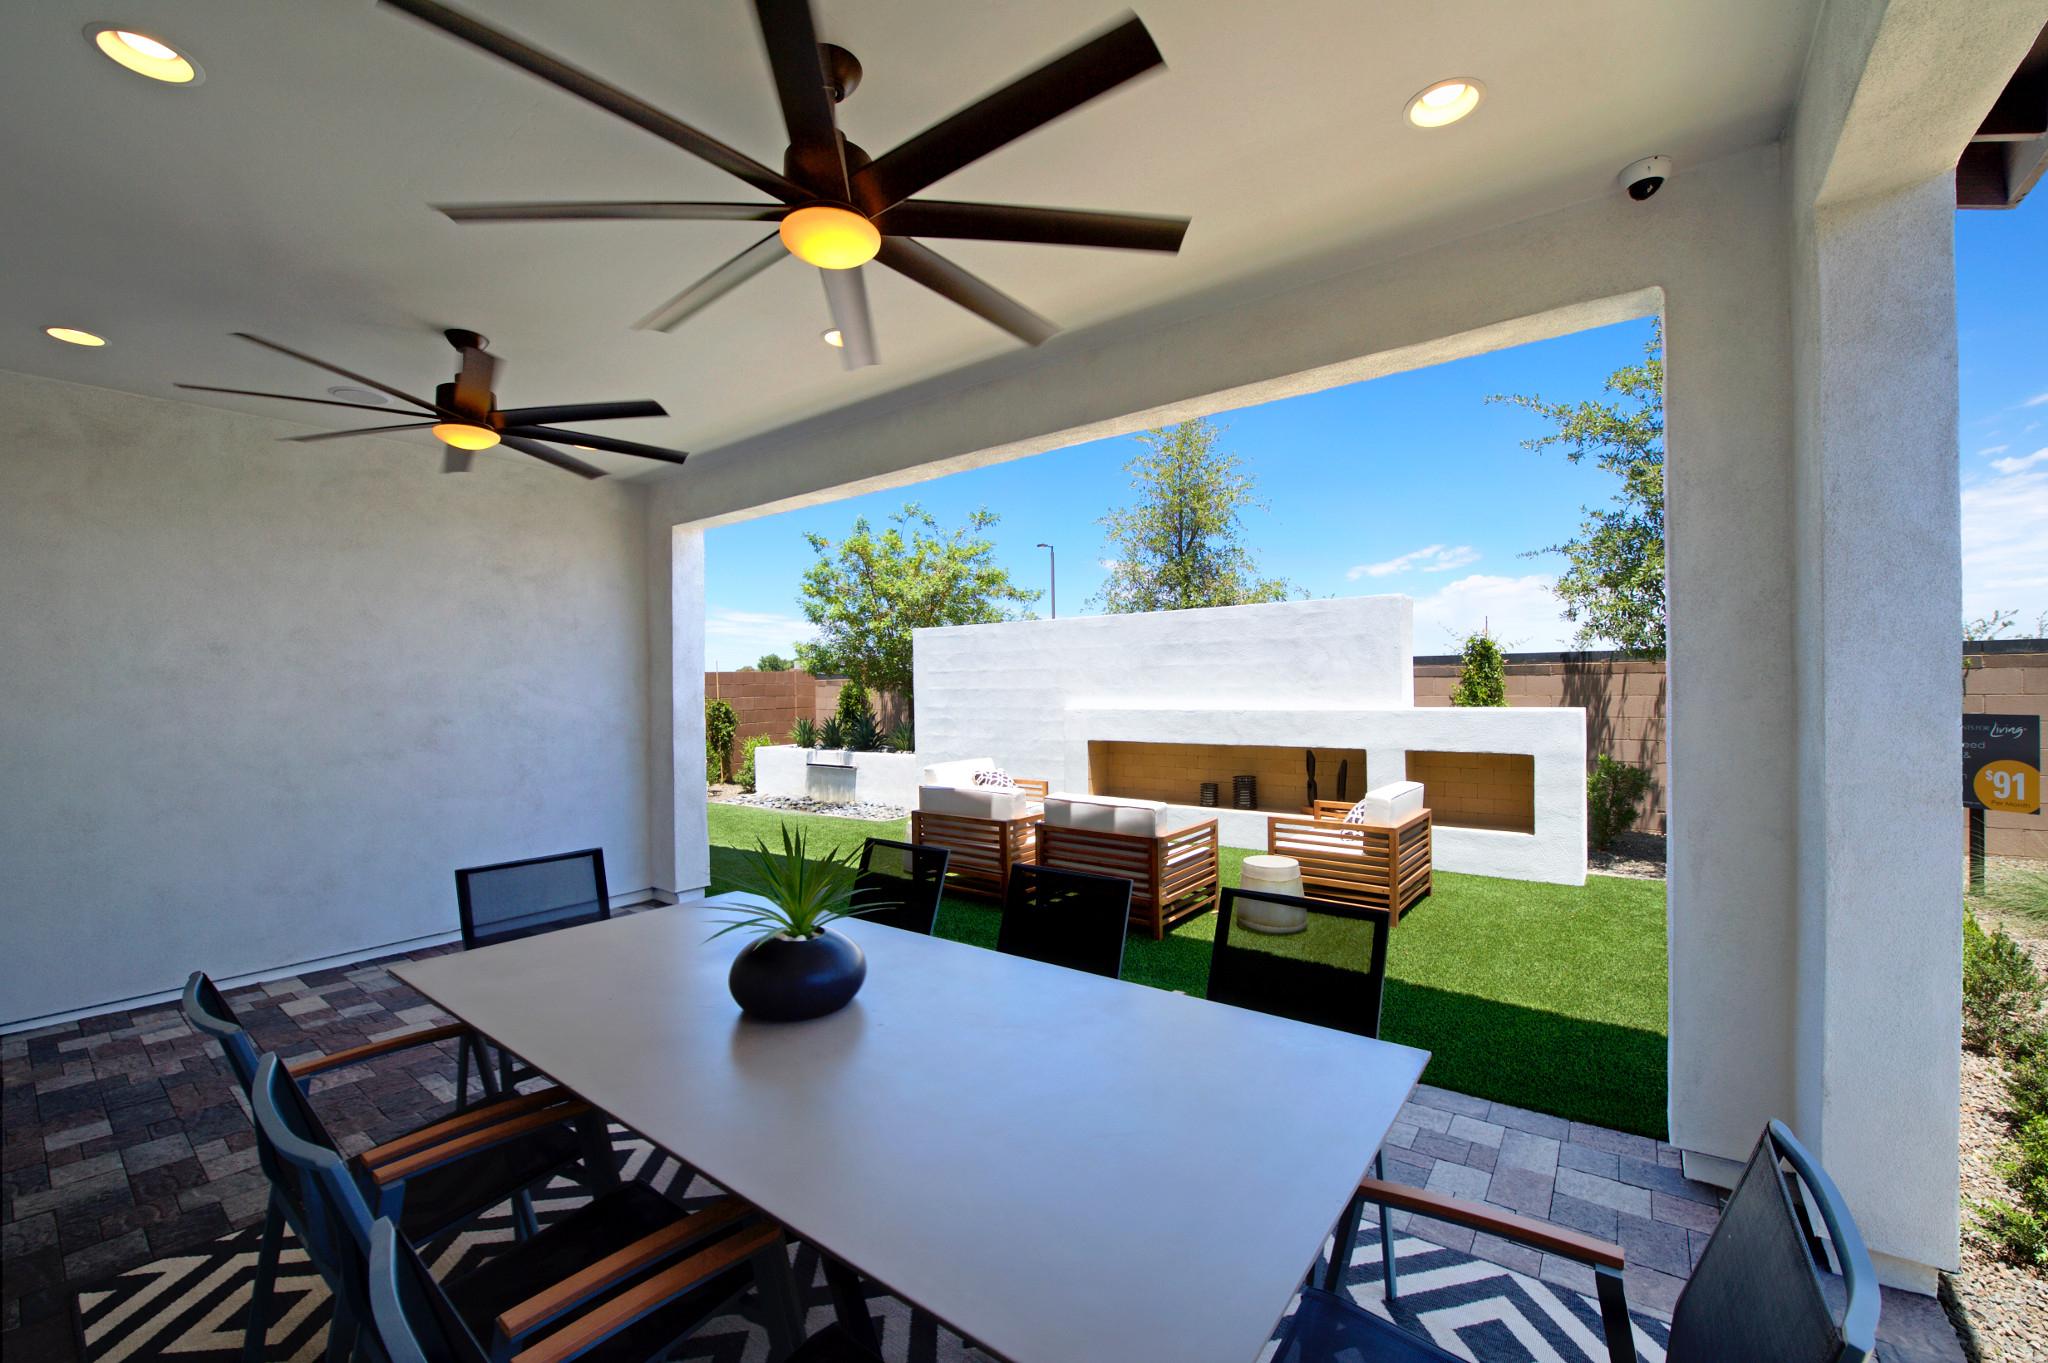 Aperture at Gateway Quarter Plan 4014 Backyard